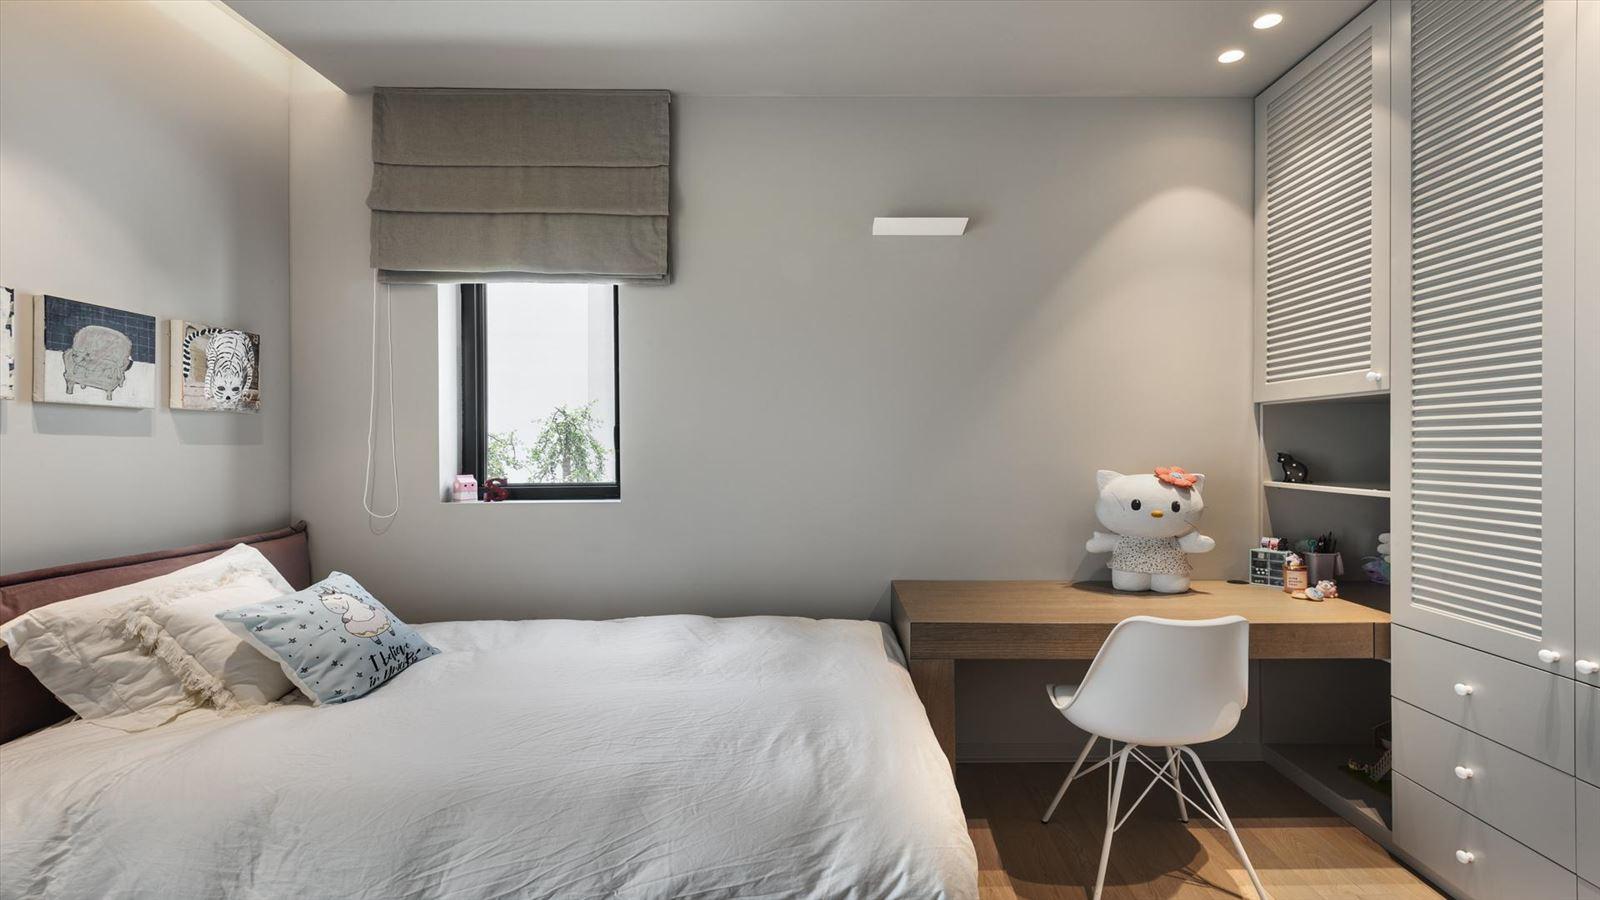 CENTRAL TLV LOFT עיצוב חדר השינה עם גופי תאורה של קמחי תאורה